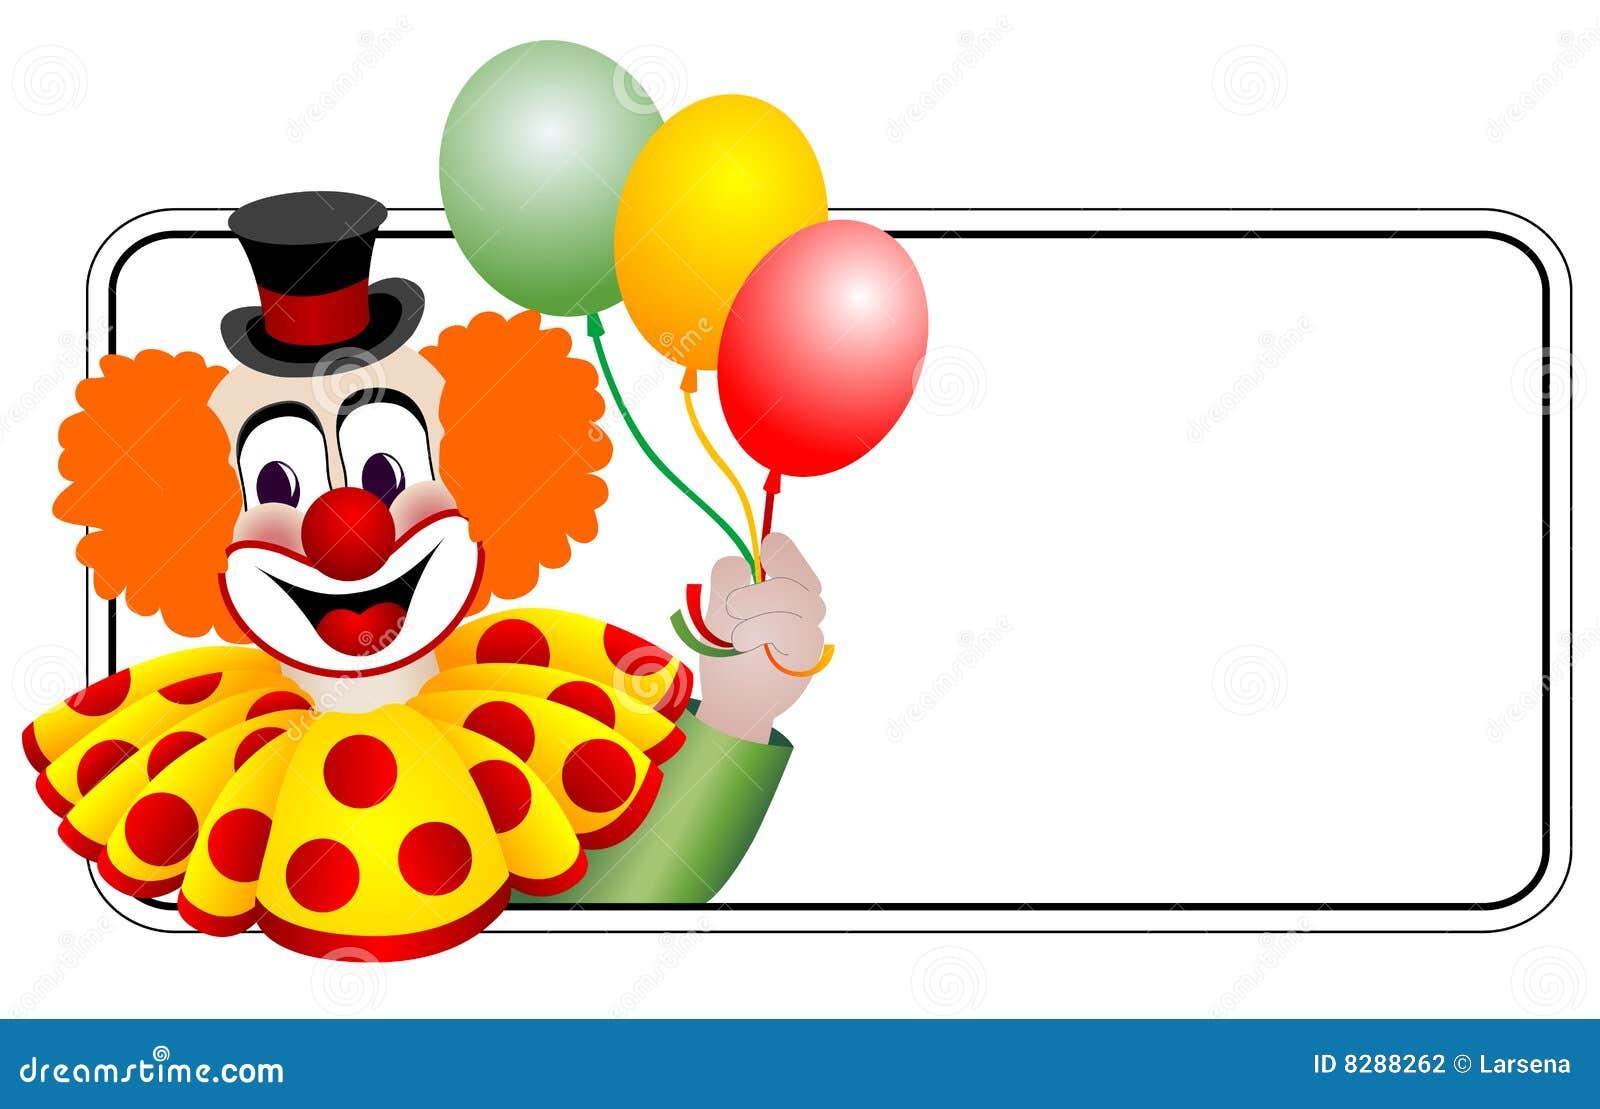 Happy Clown Stock Photography - Image: 8288262